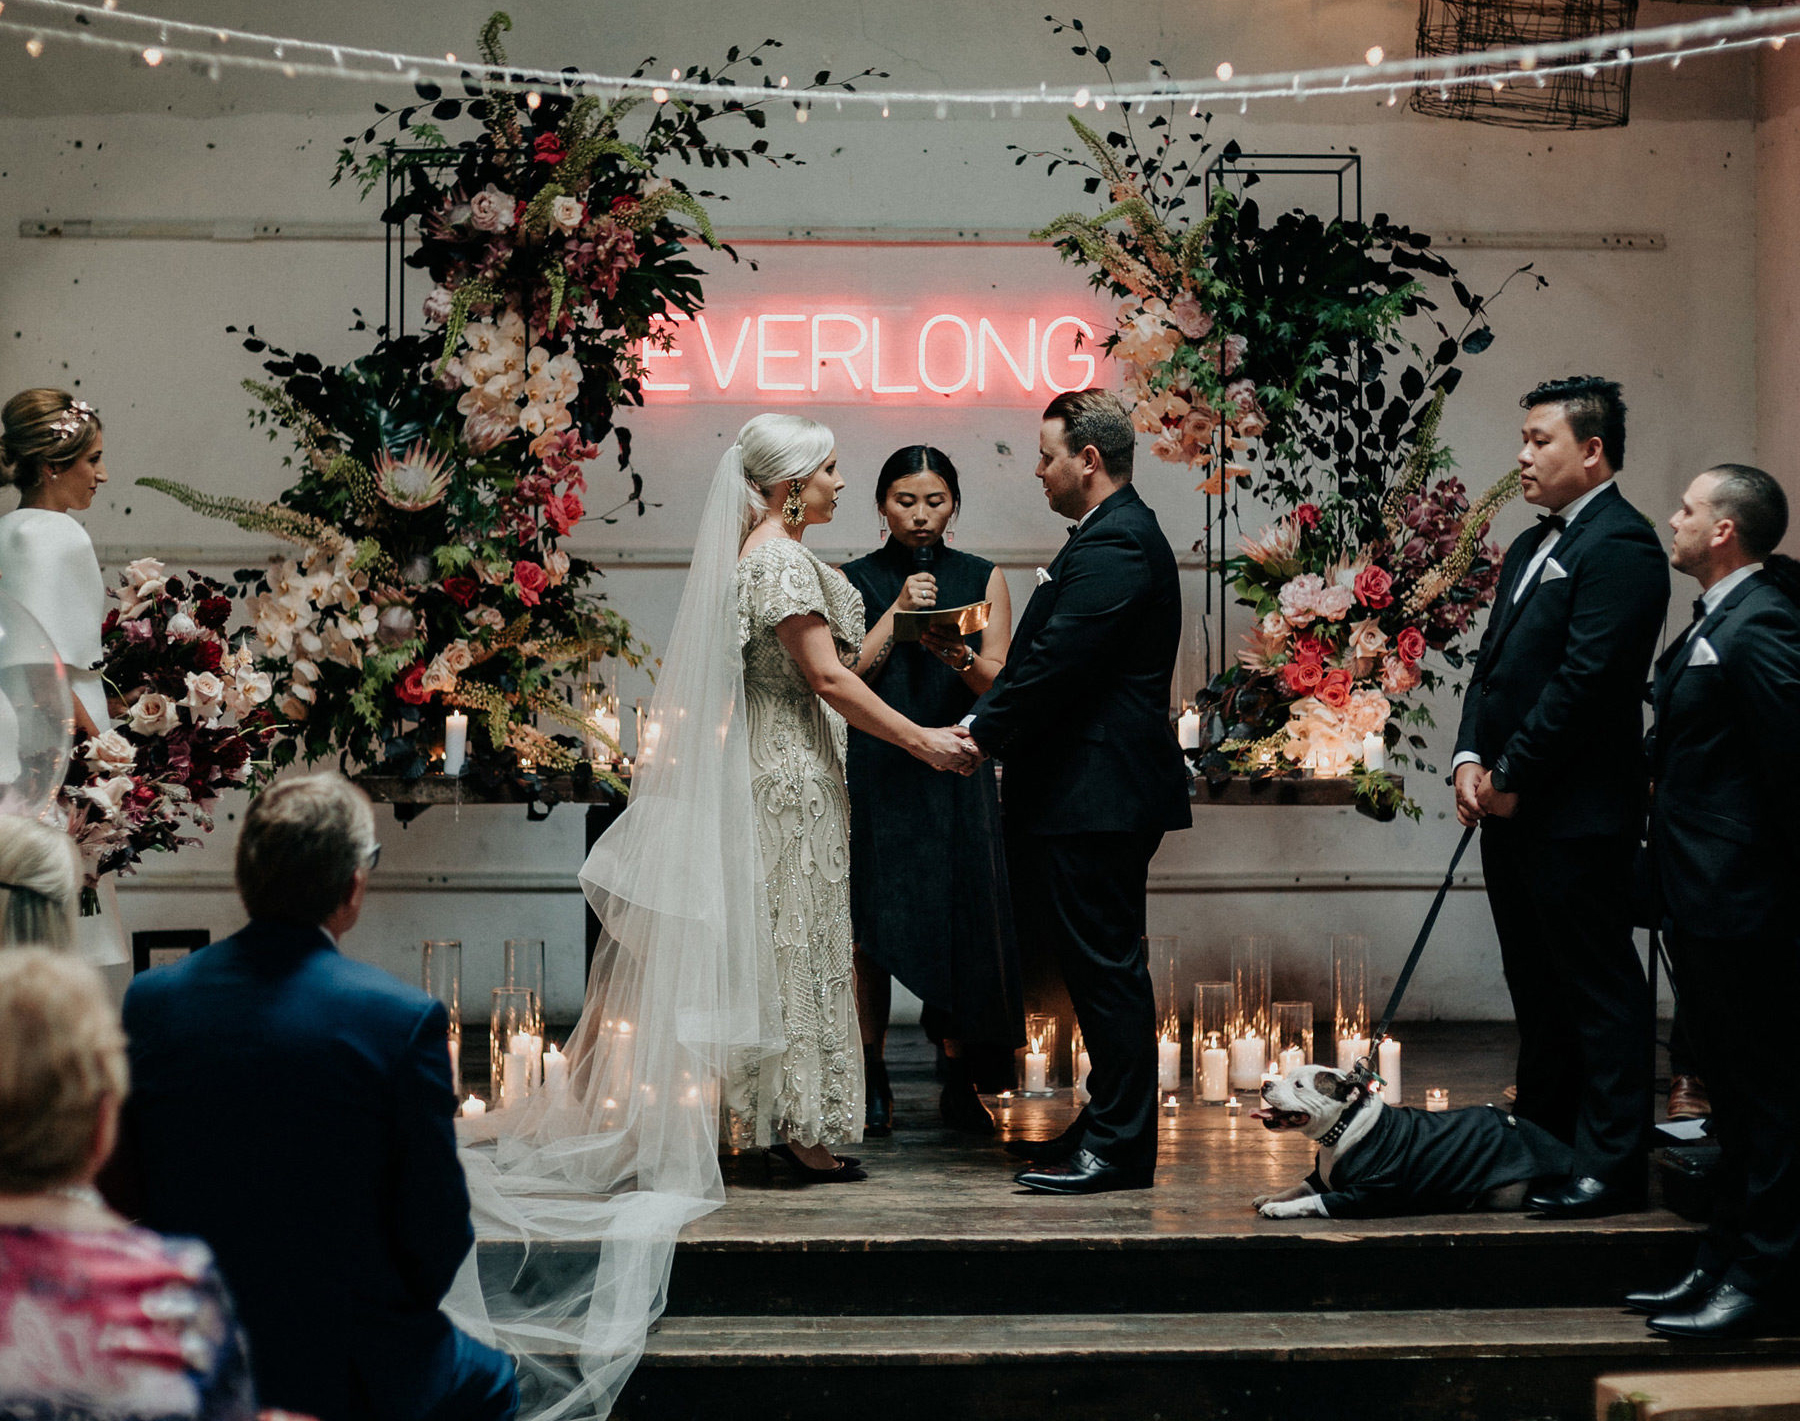 Everlong Wedding Sign